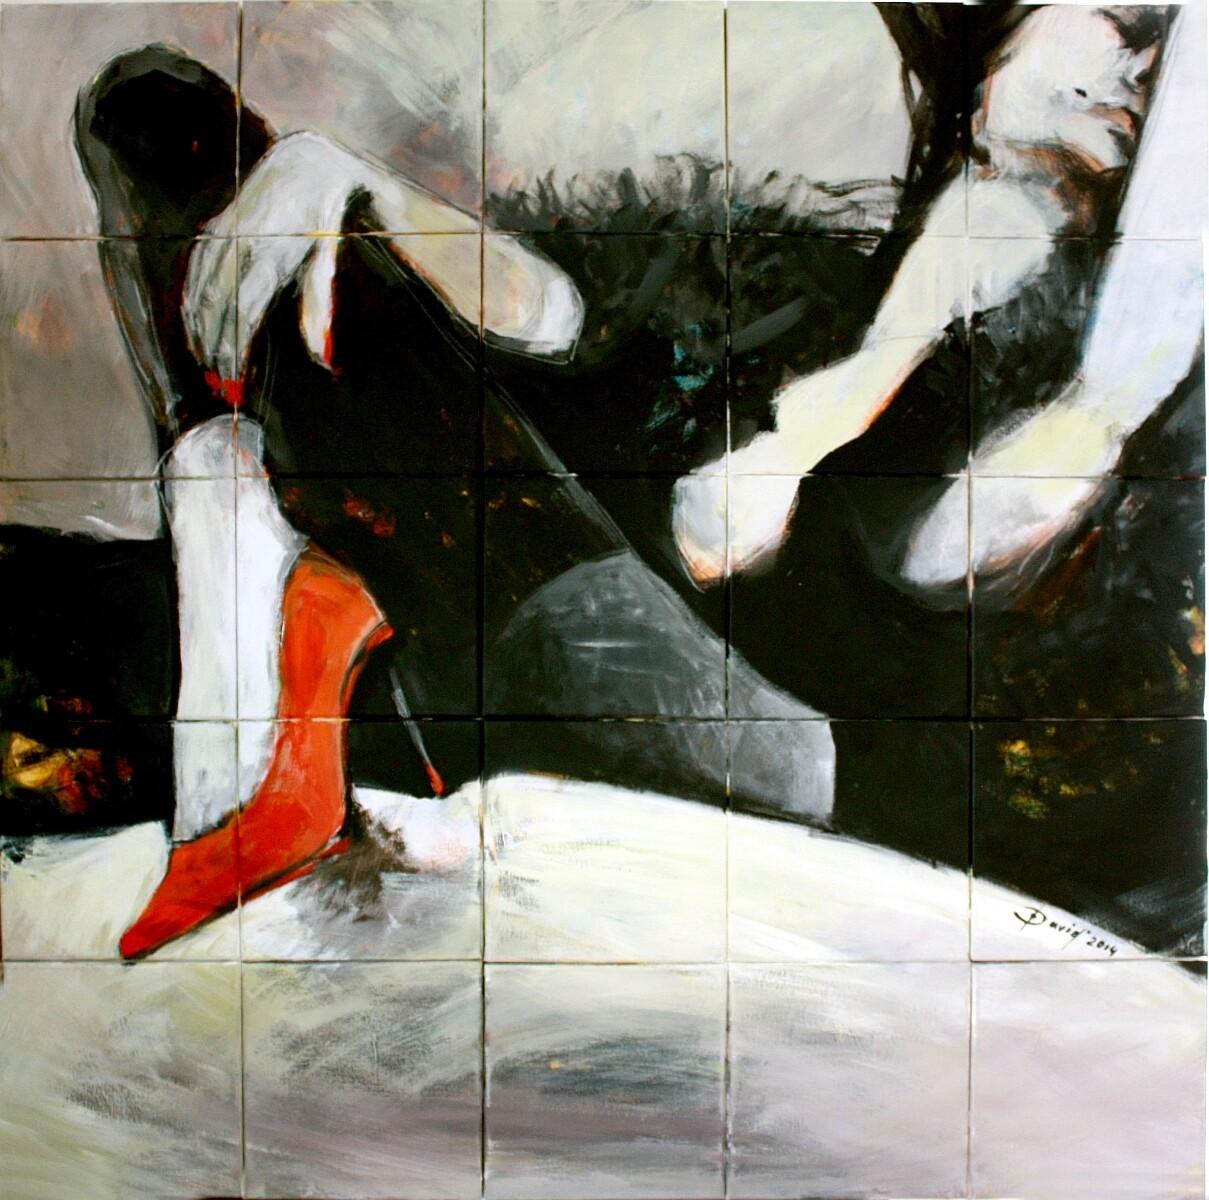 Ladies Zeug, Original Acryl Gemälde, Segmentmalerei, 100x100cm Großformat, gerahmt